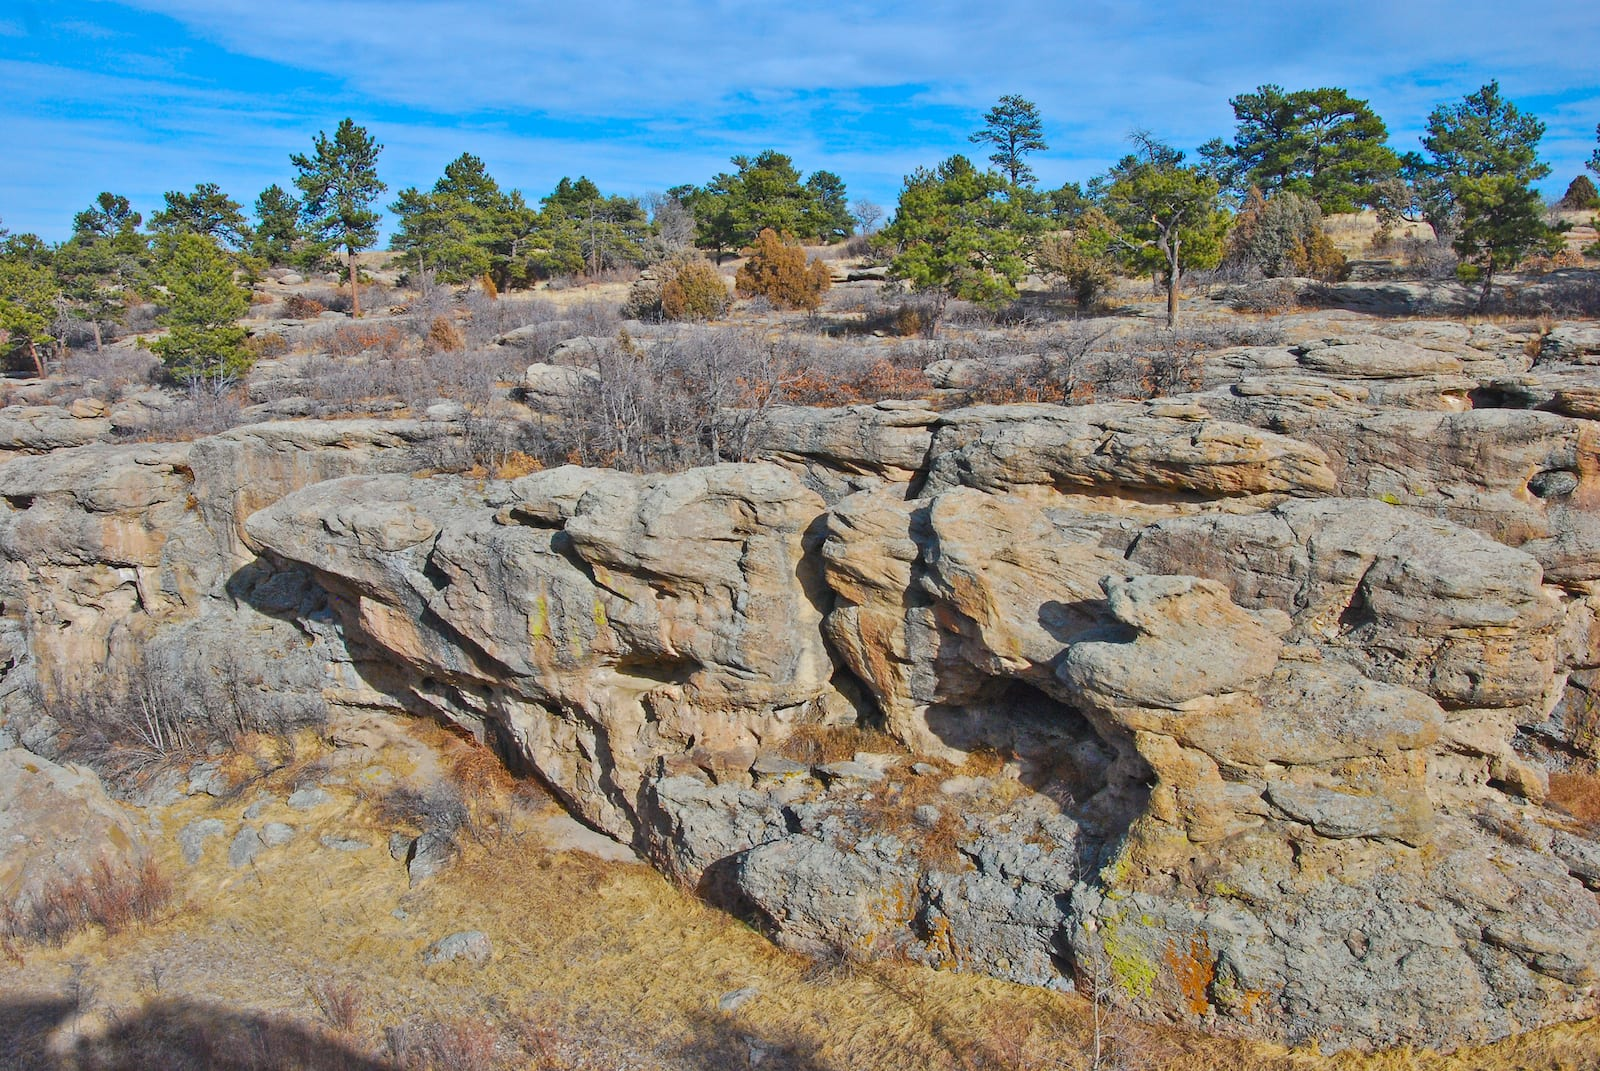 Castlewood Canyon State Park Boulders